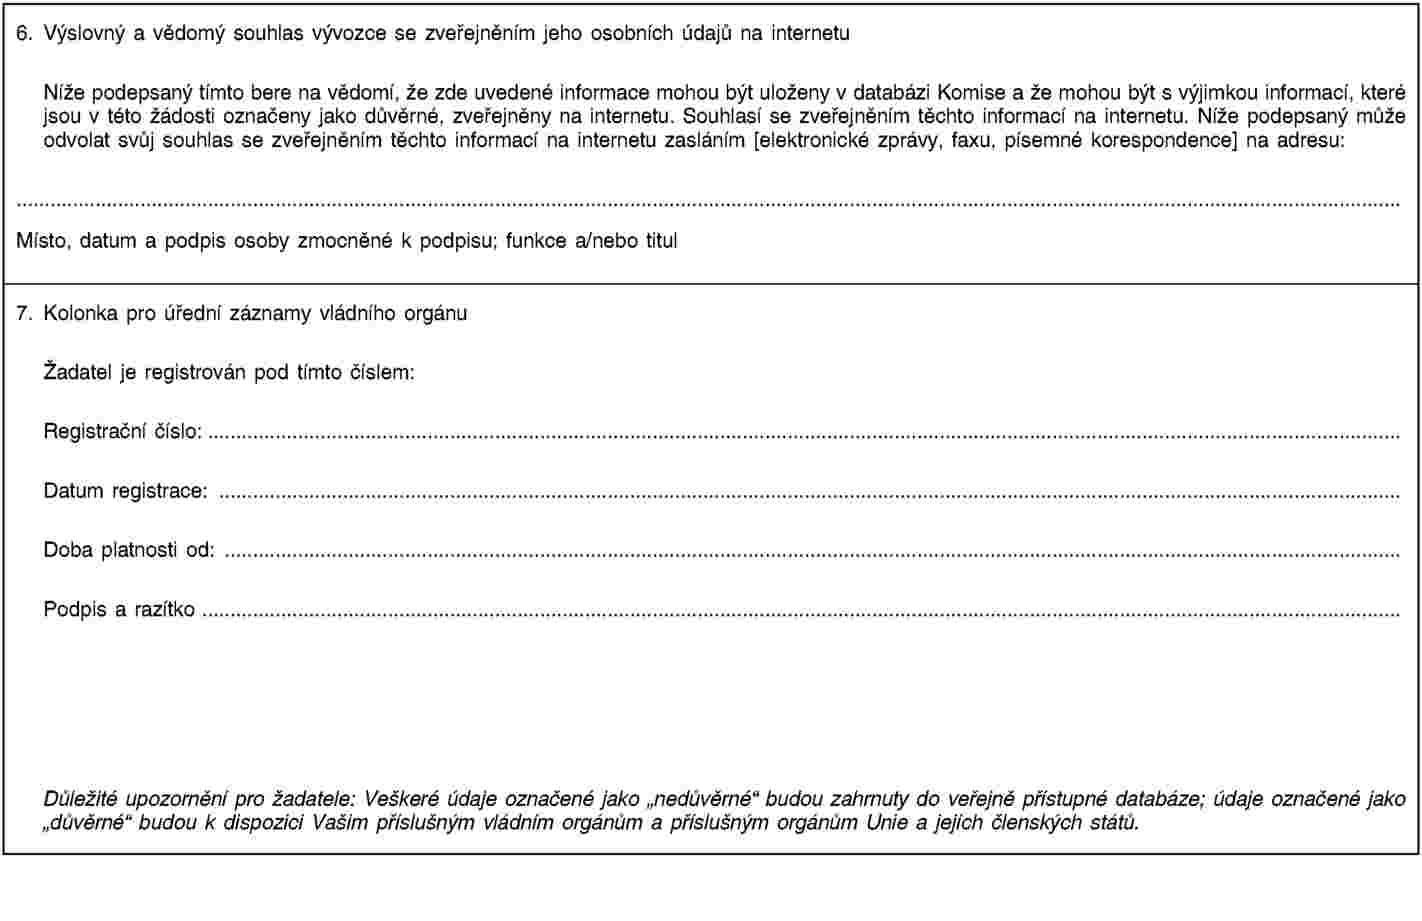 Audience Analysis Worksheet Example  Briefencounters For Audience Analysis Worksheet Example